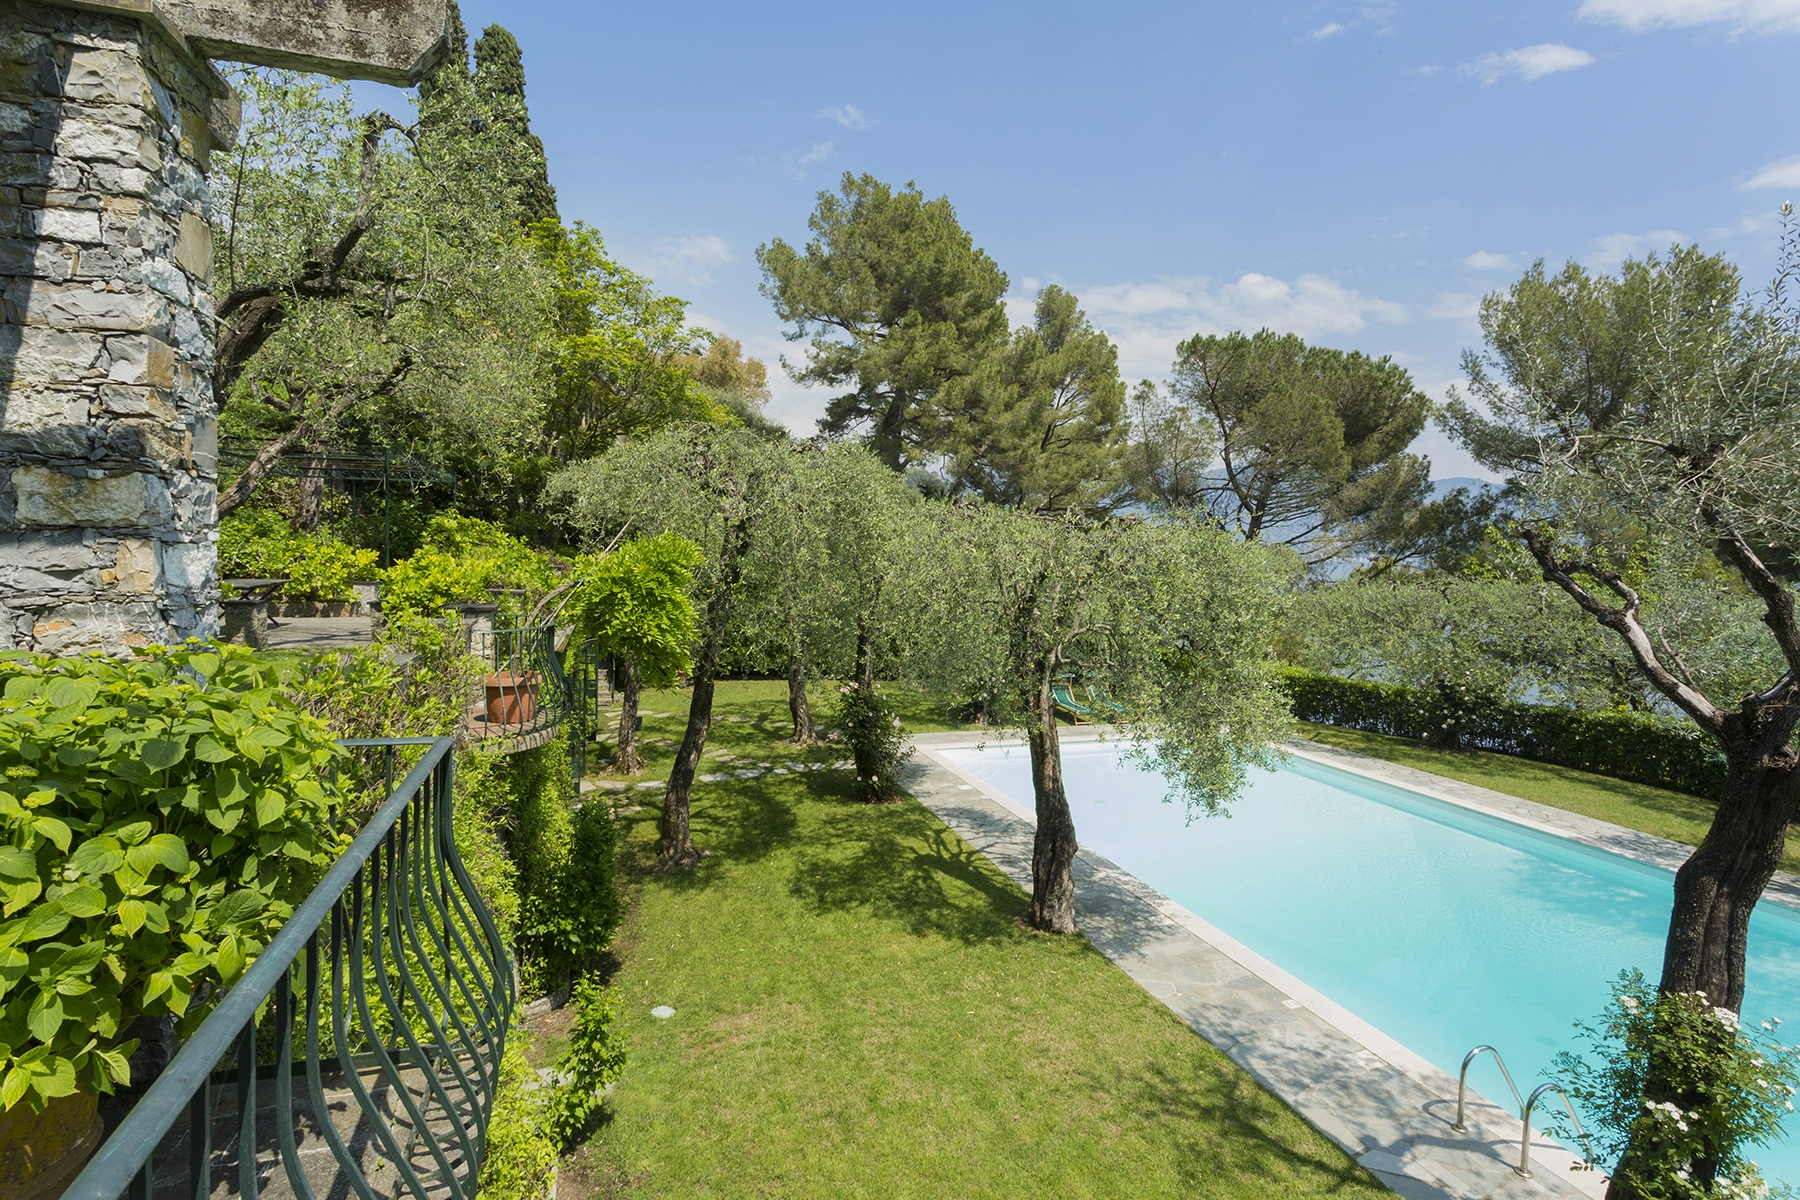 Villa in Vendita a Santa Margherita Ligure: 5 locali, 580 mq - Foto 10